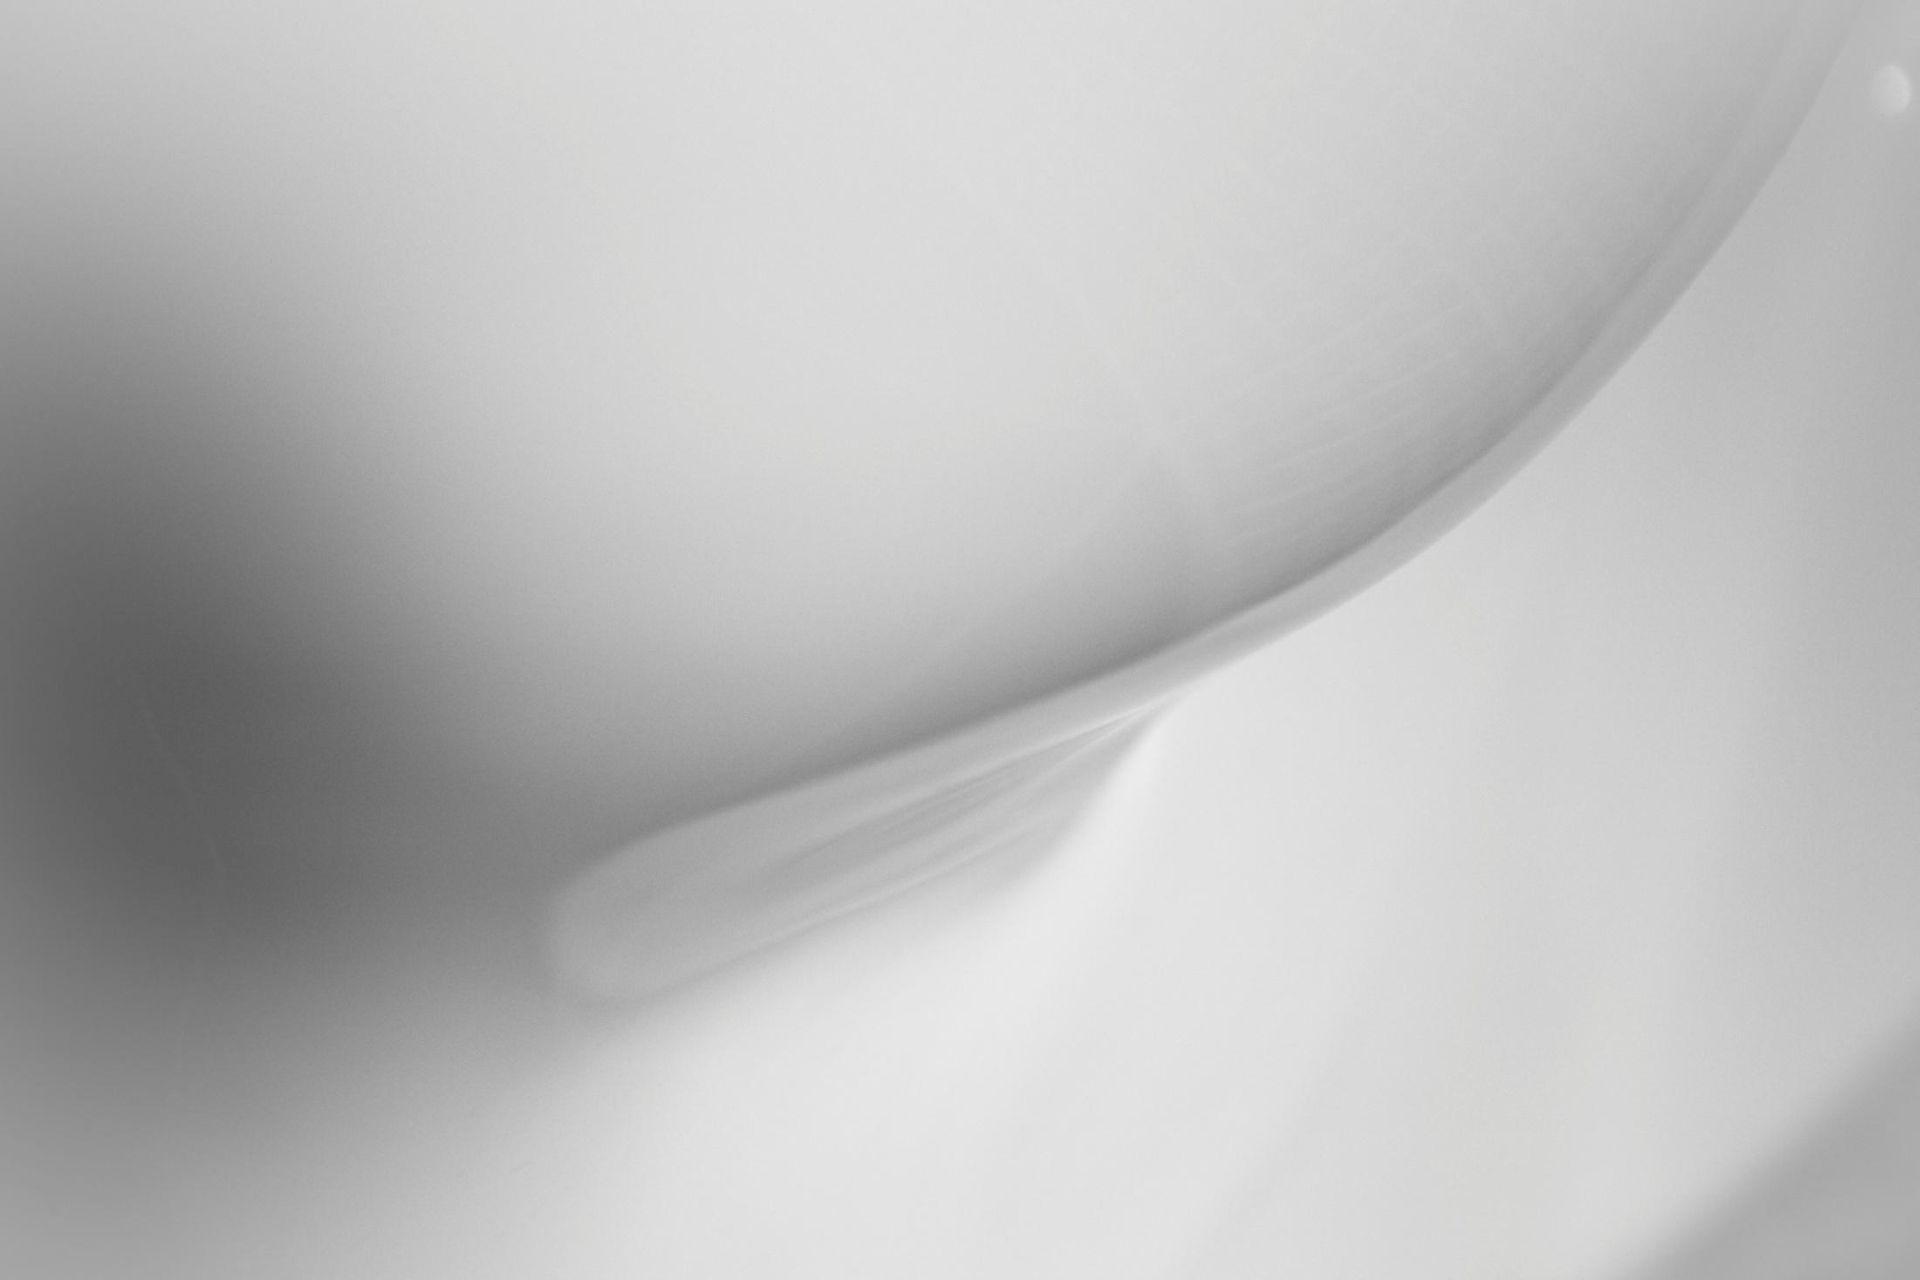 D Eigen werk Pinhole badkamer (6)